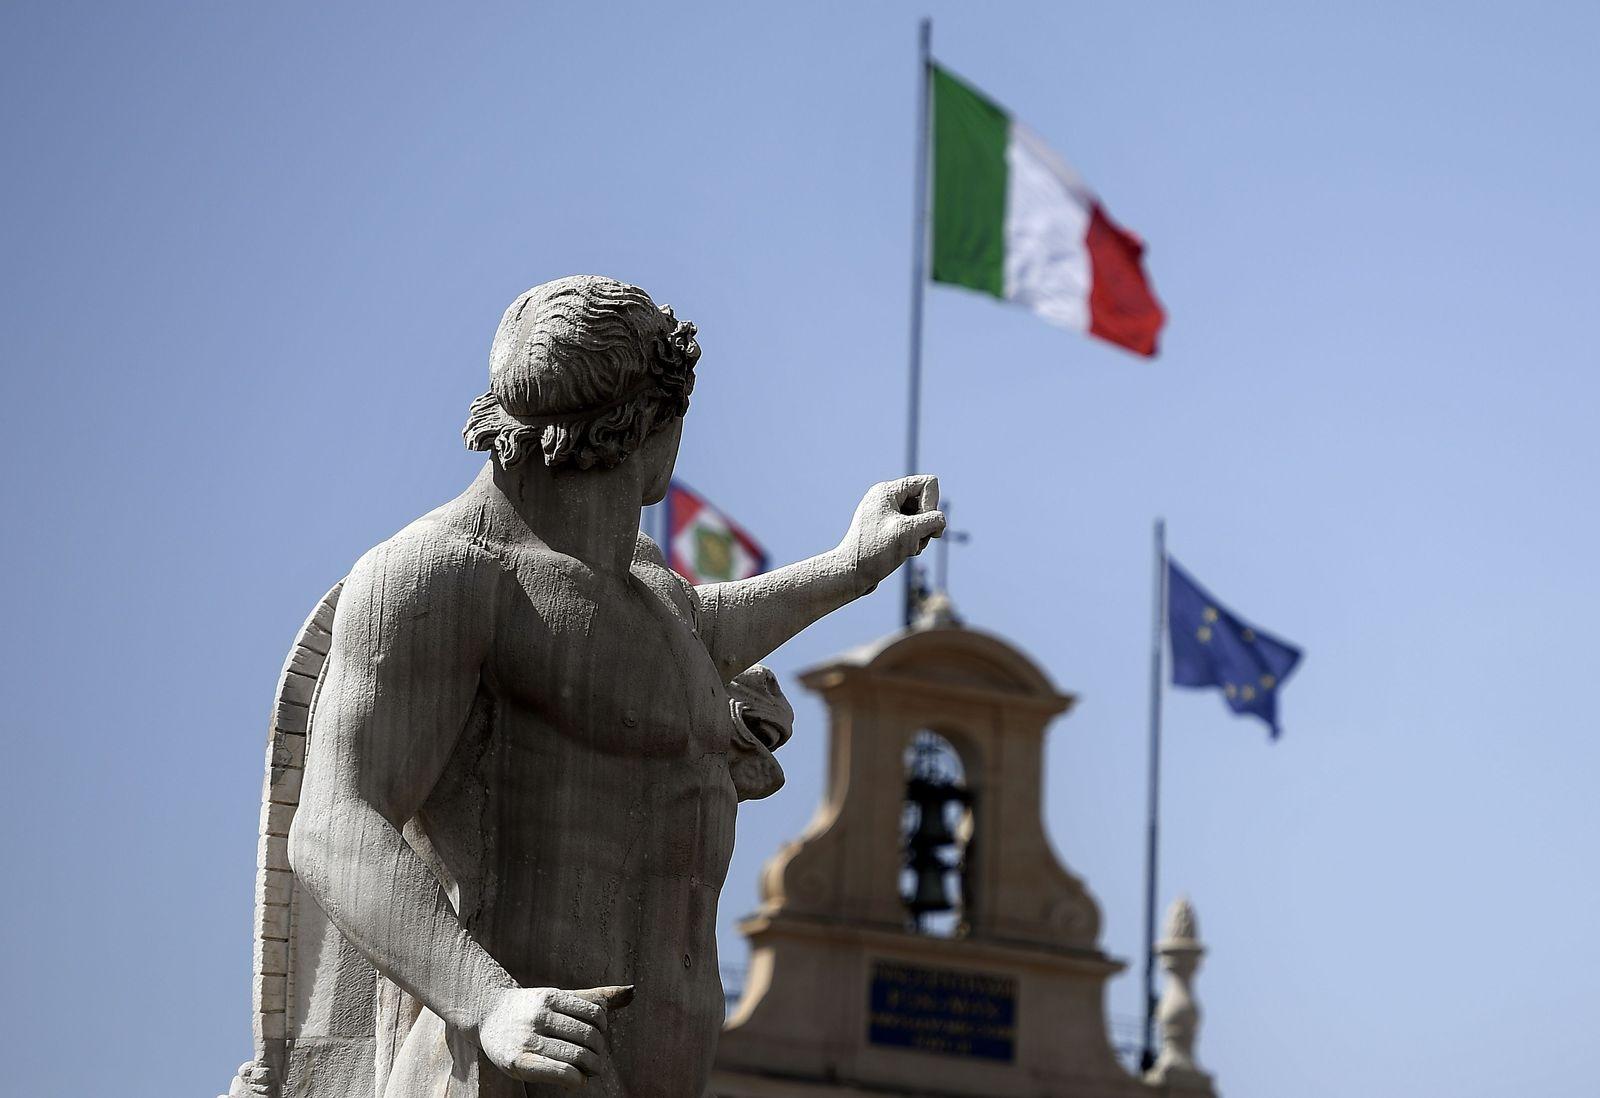 ITALY-POLITICS-GOVERNMENT-MONUMENT